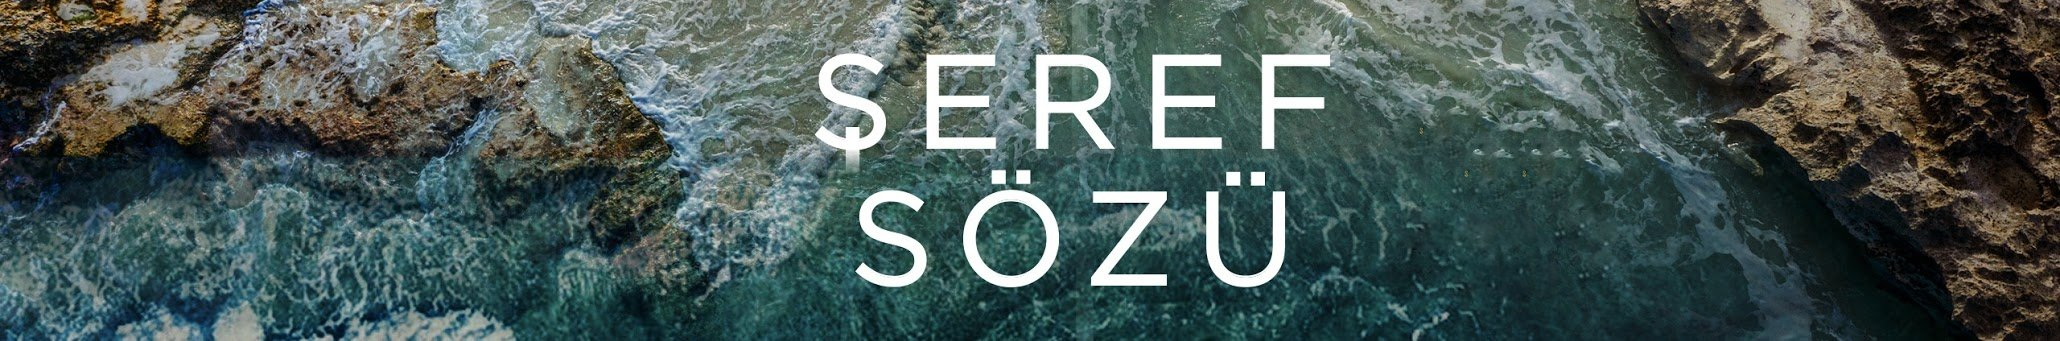 Seref Sozu English subtitles | Word Of Honor